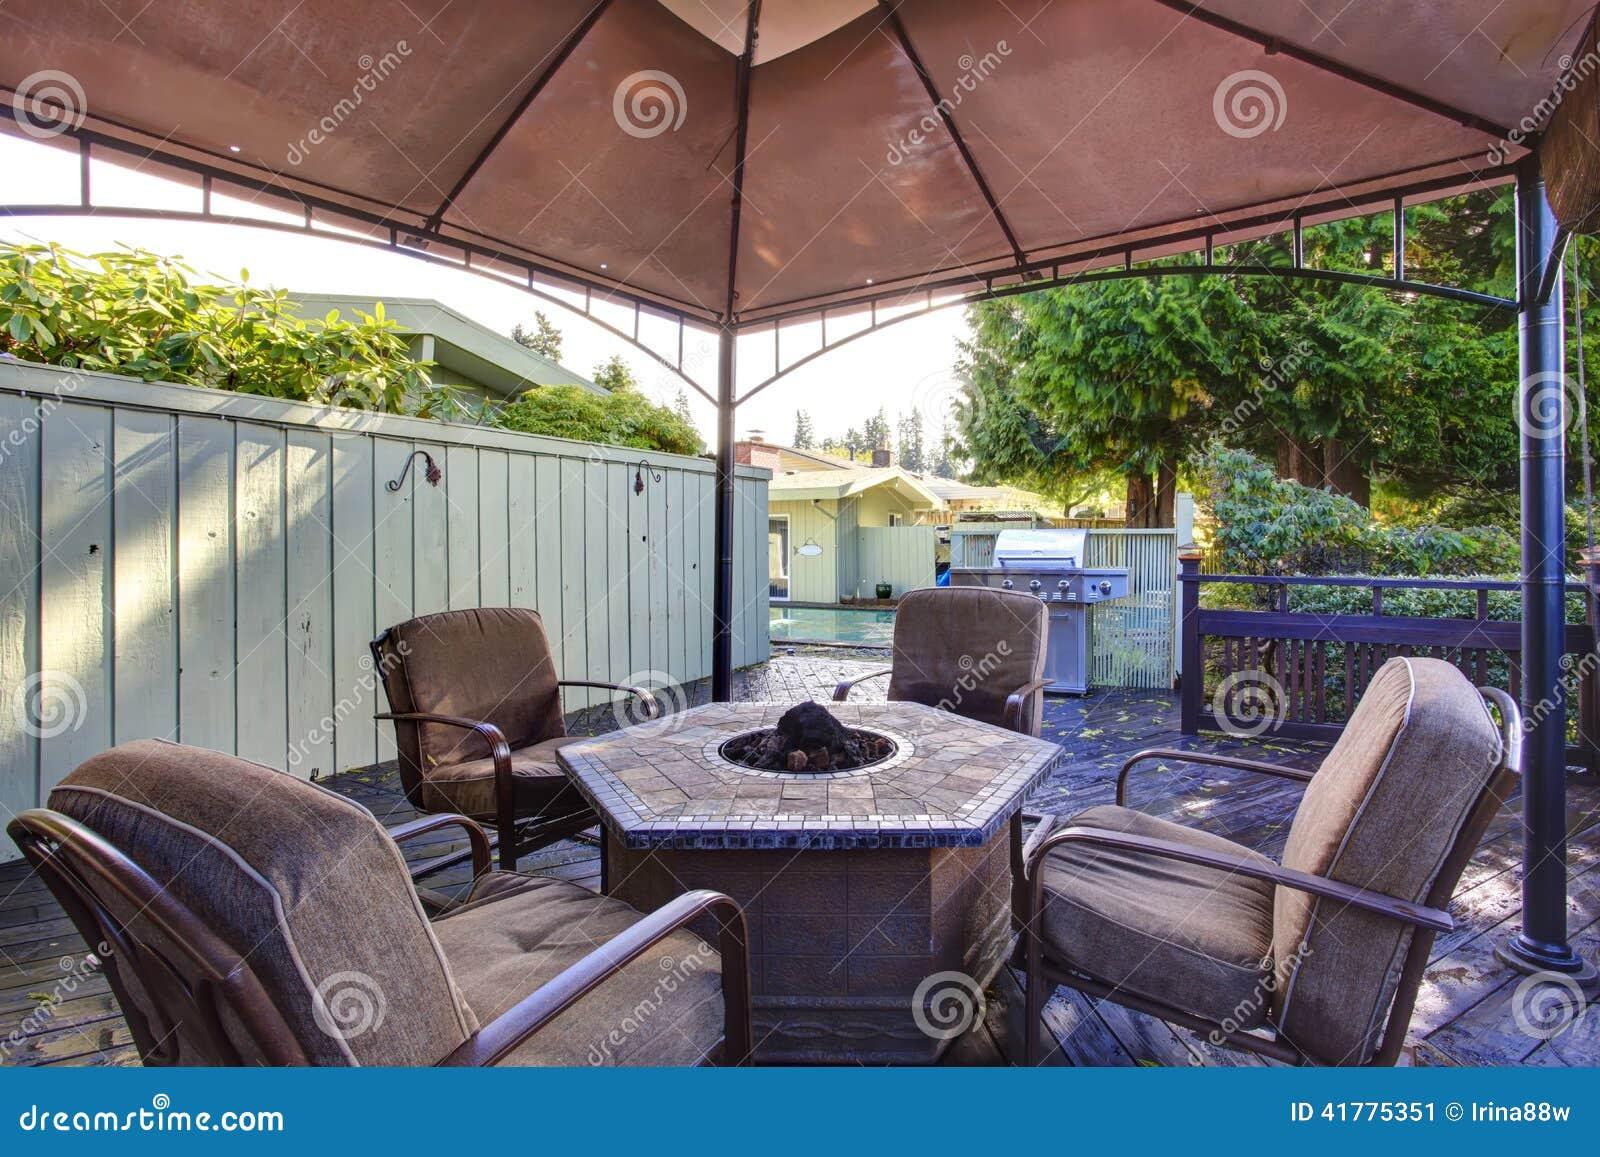 Backyard Gazebo With Patio Set Stock Image Image Of Back Rental 41775351